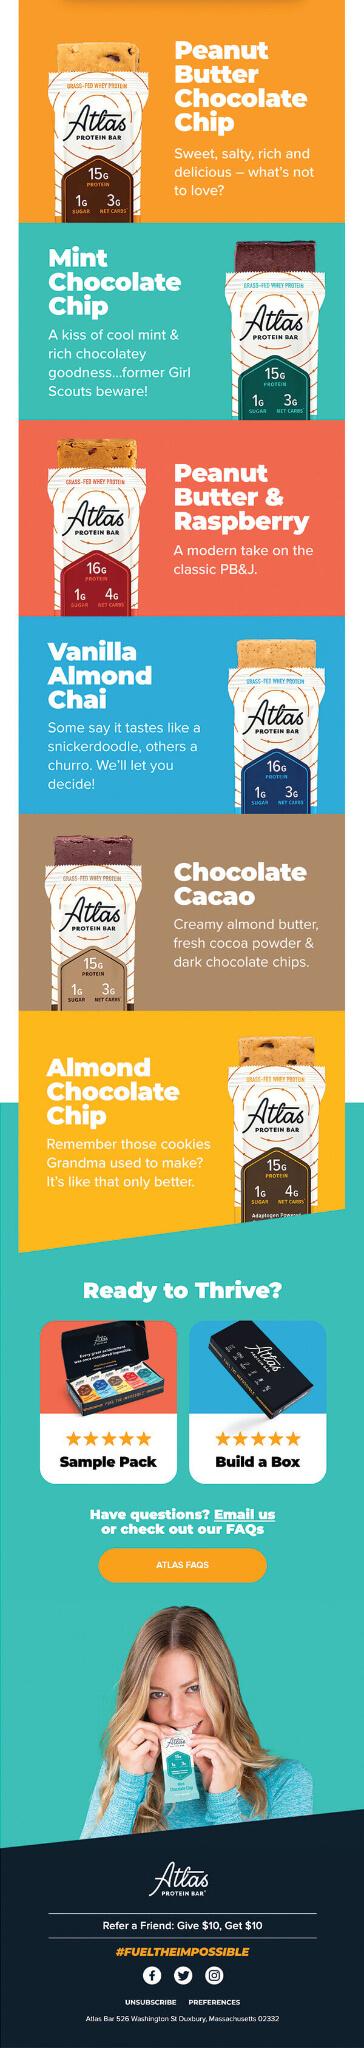 Atlas-full-design-part-2